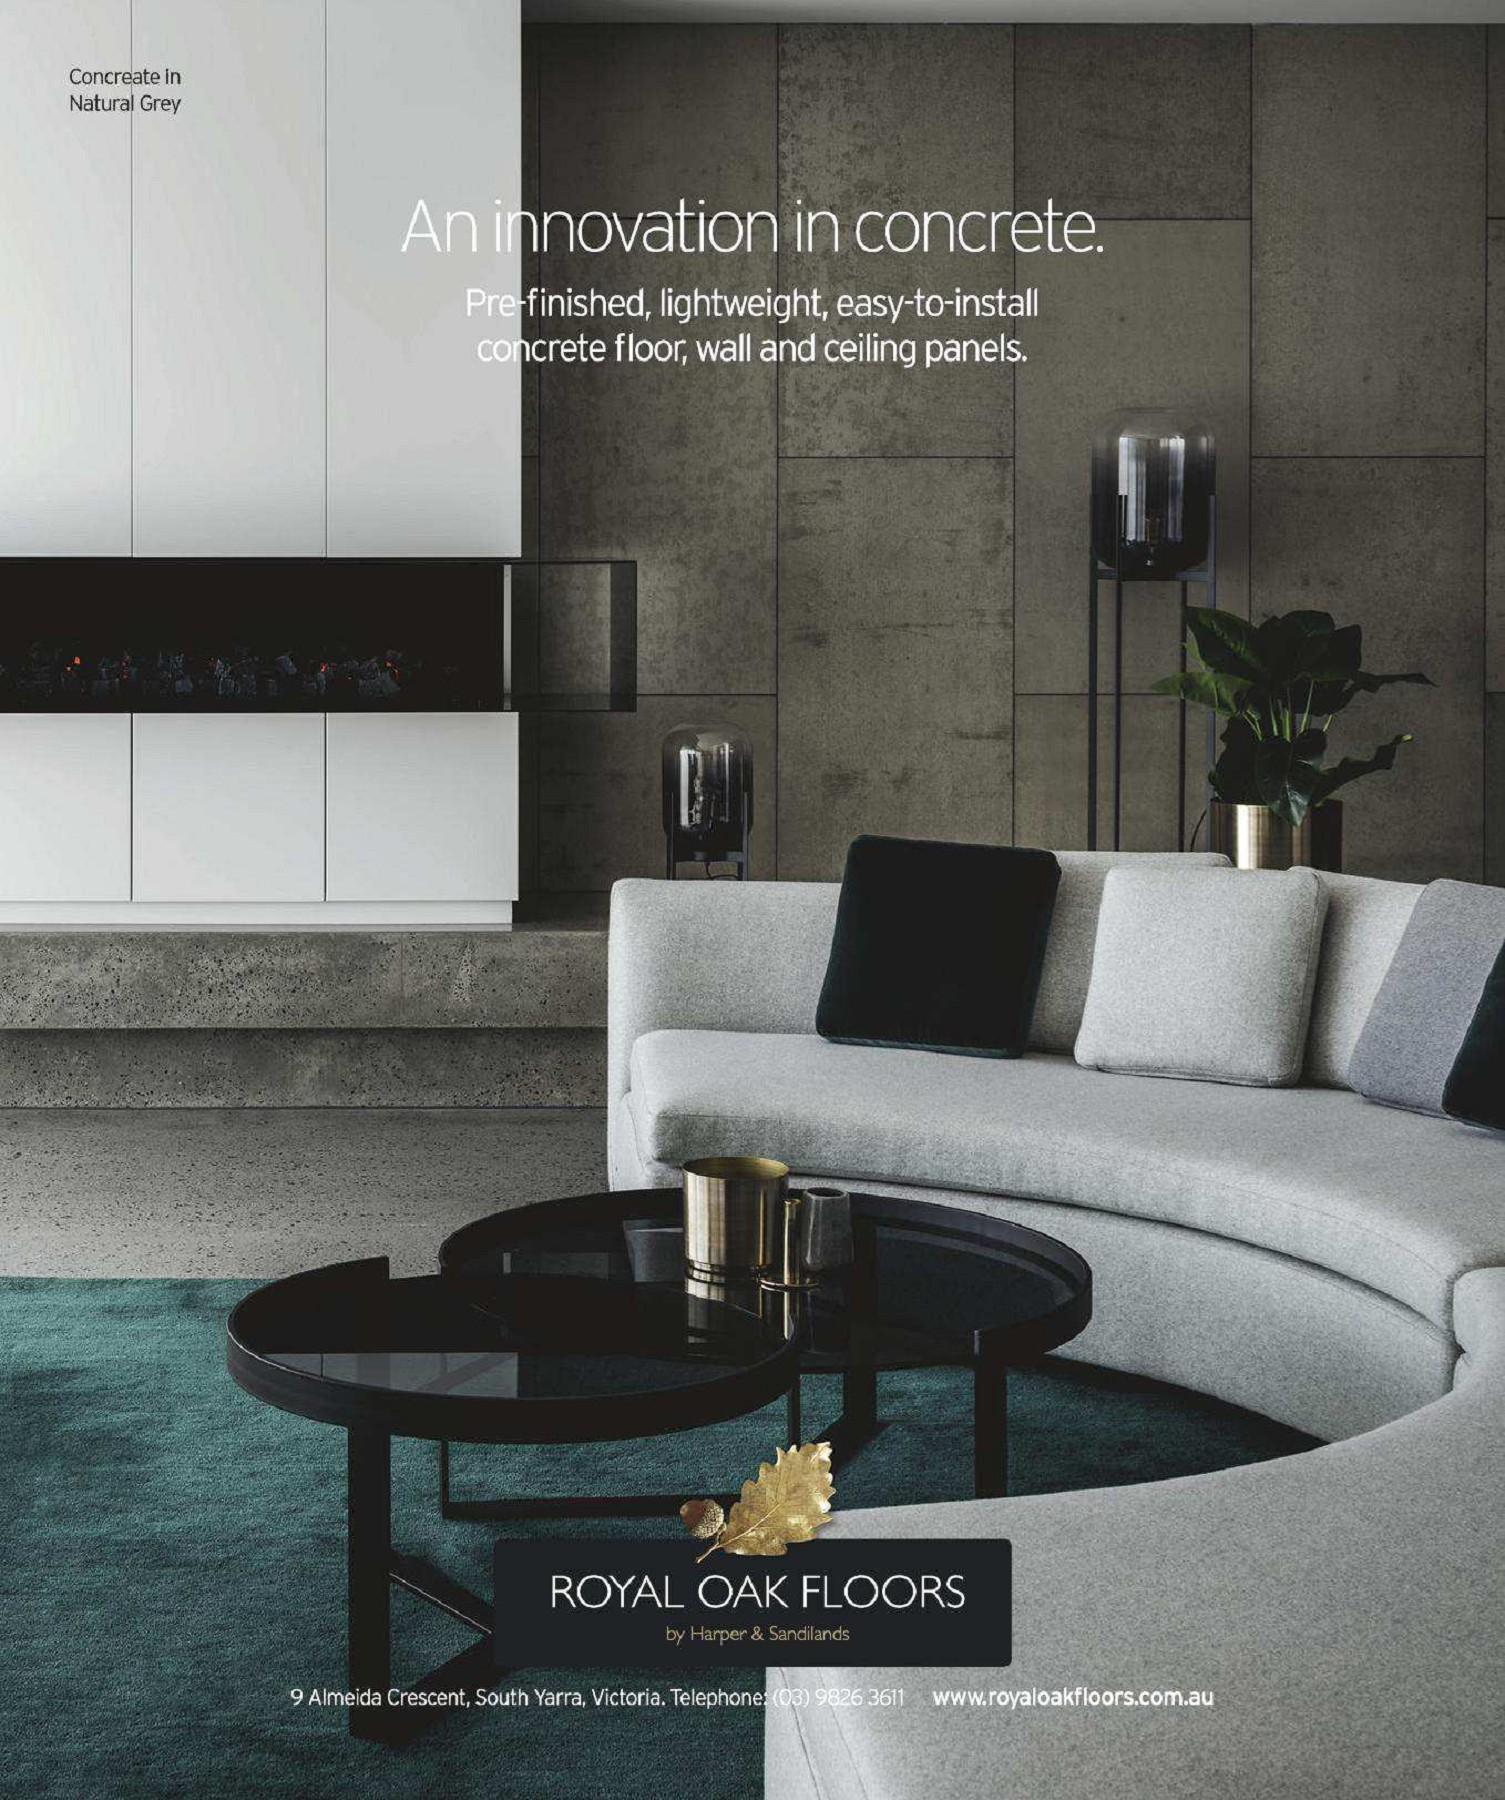 Studio Parisi E Associati Milano vogue australia living_julaug 2018-flip book pages 101-150